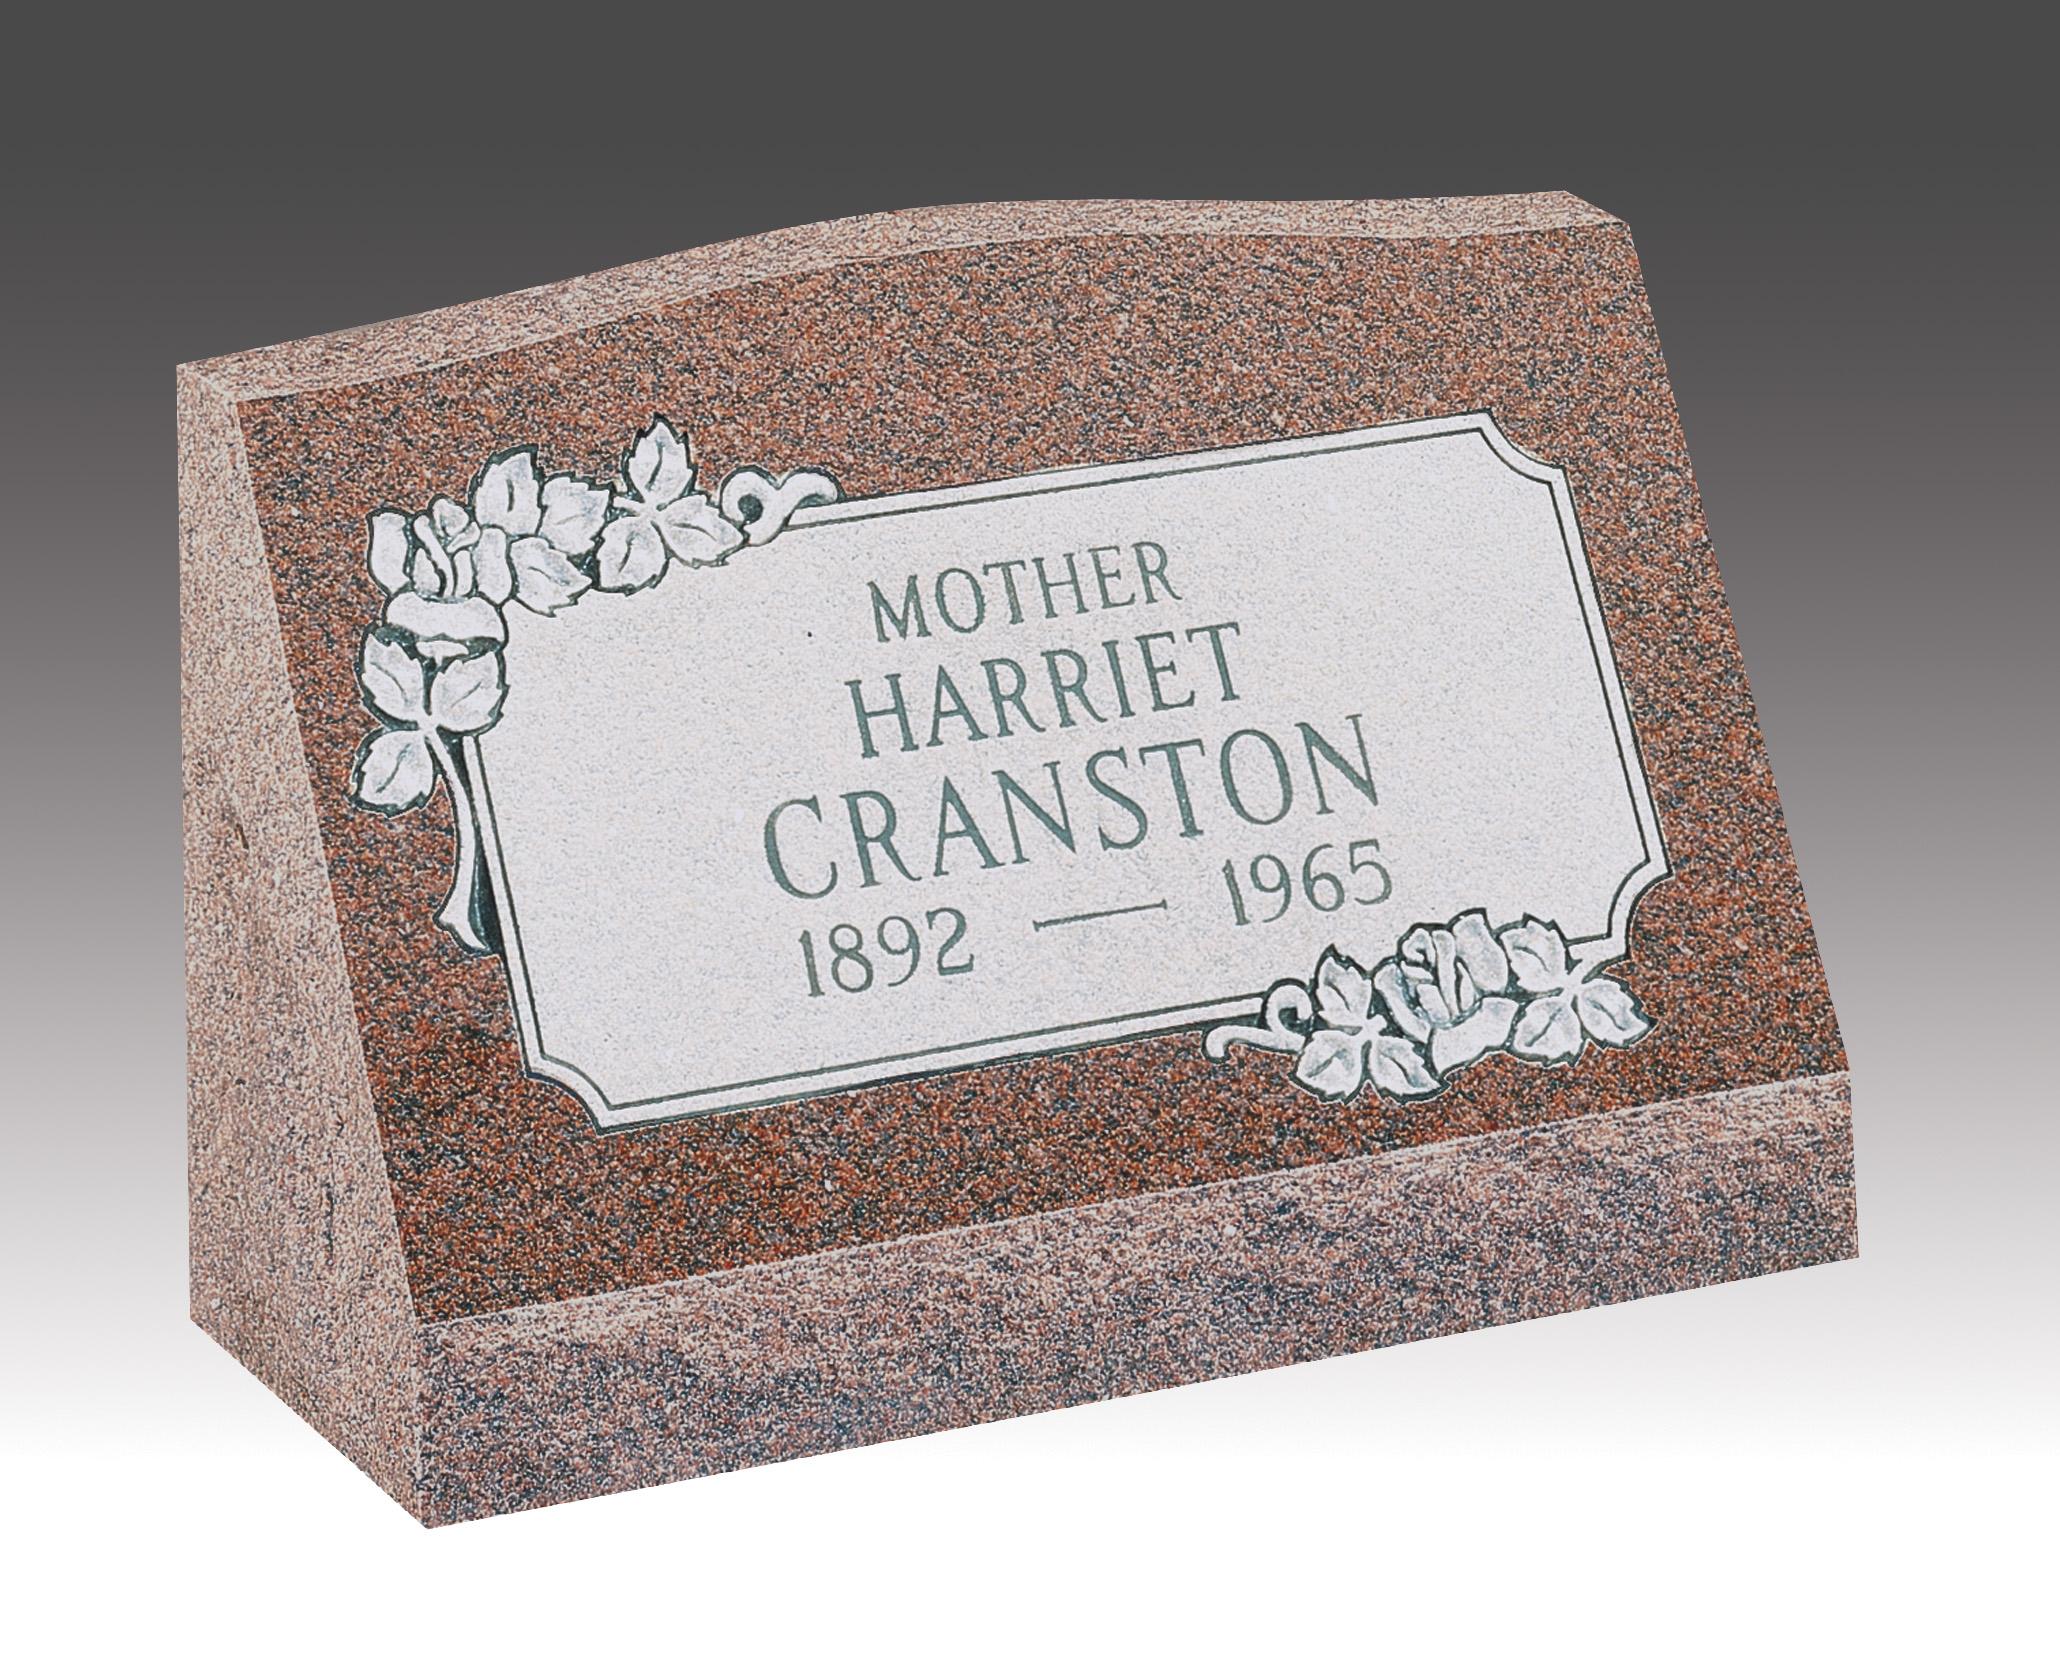 Cranston.jpg